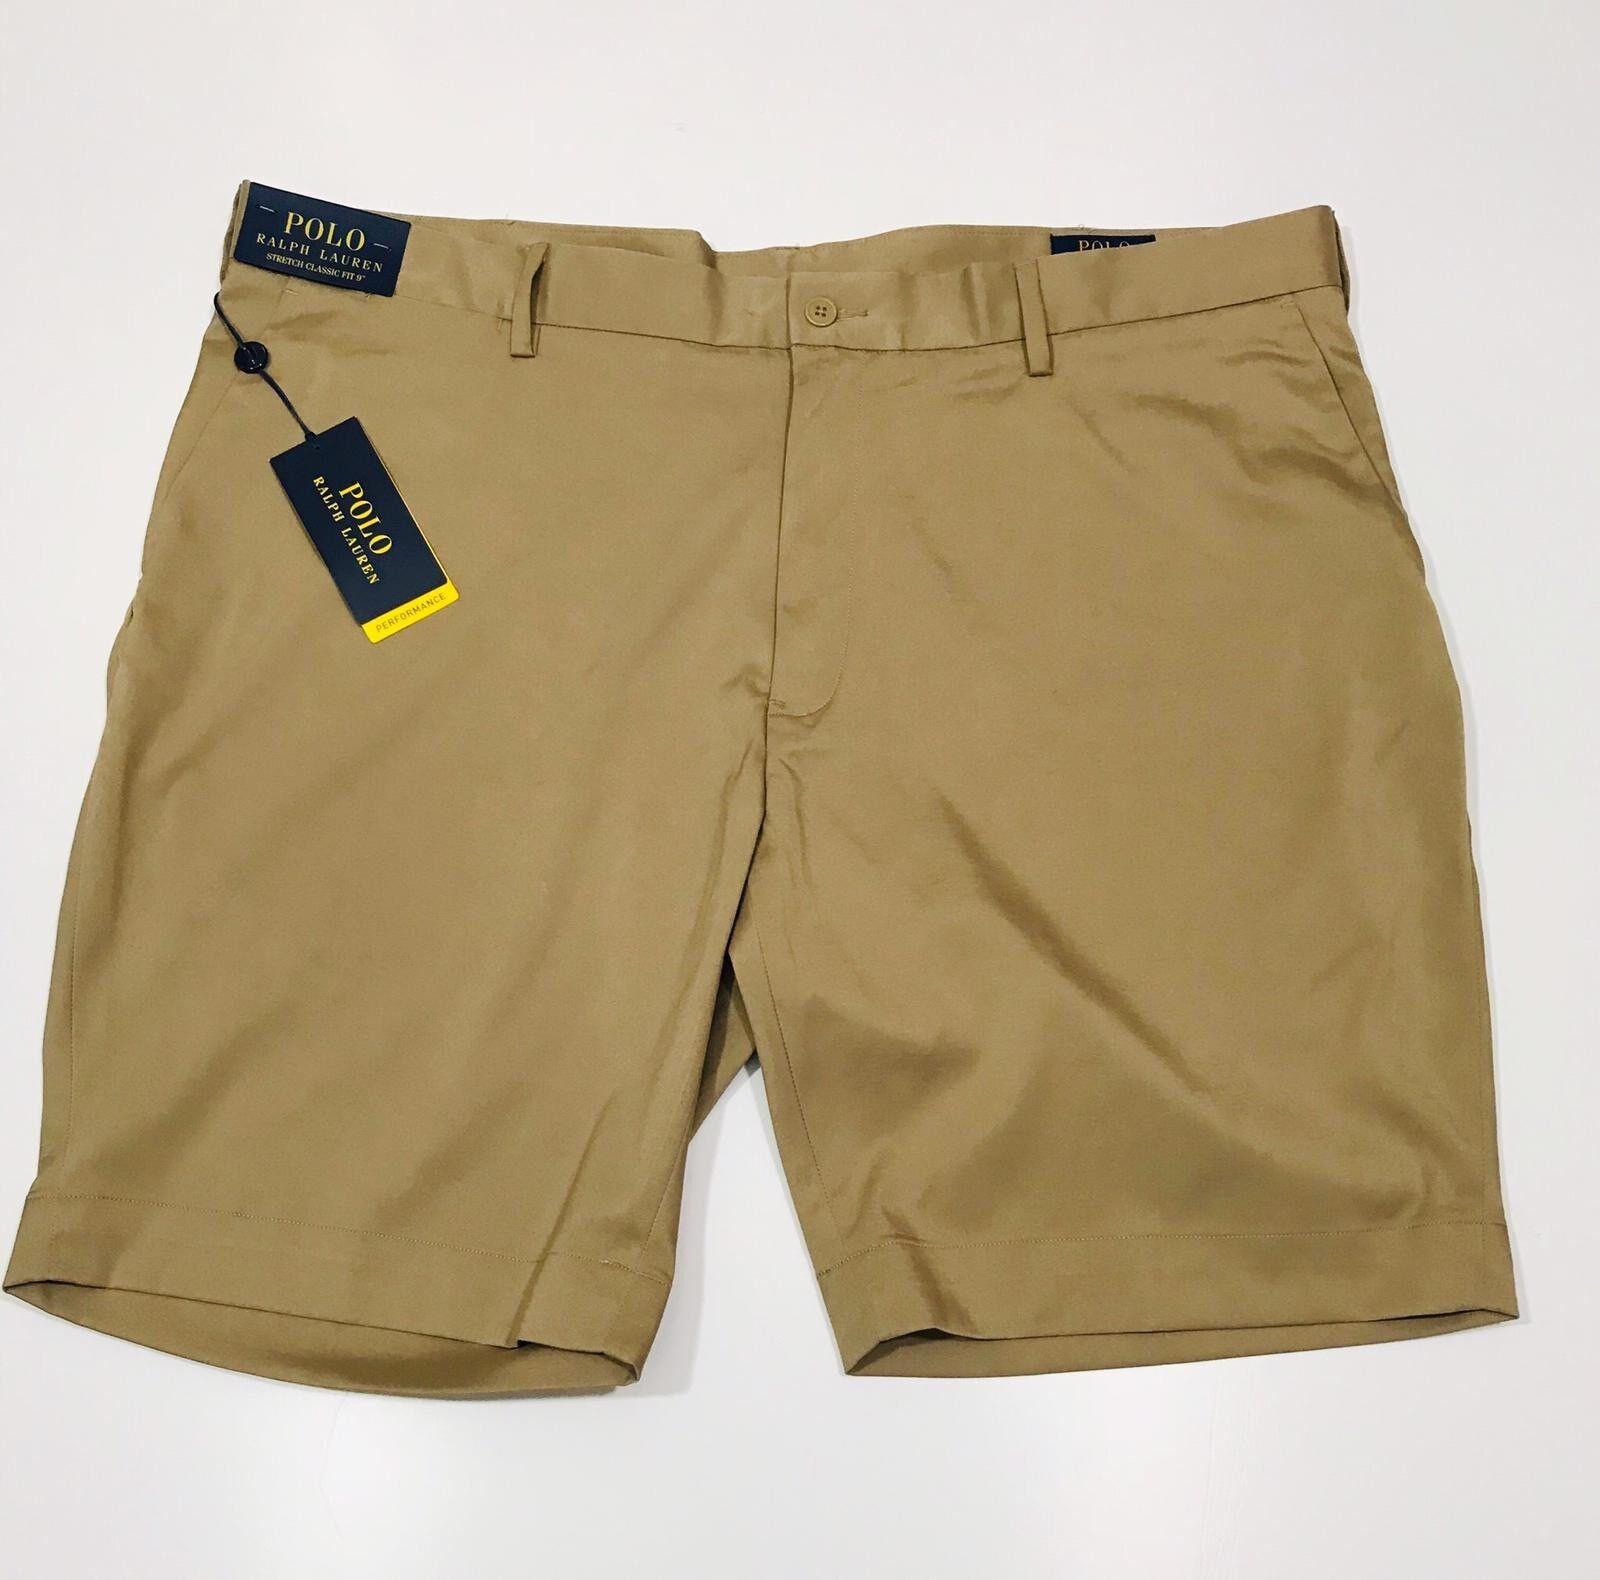 Ralph Lauren Shorts Stretch Classic Fit        (Size 42)           RRP